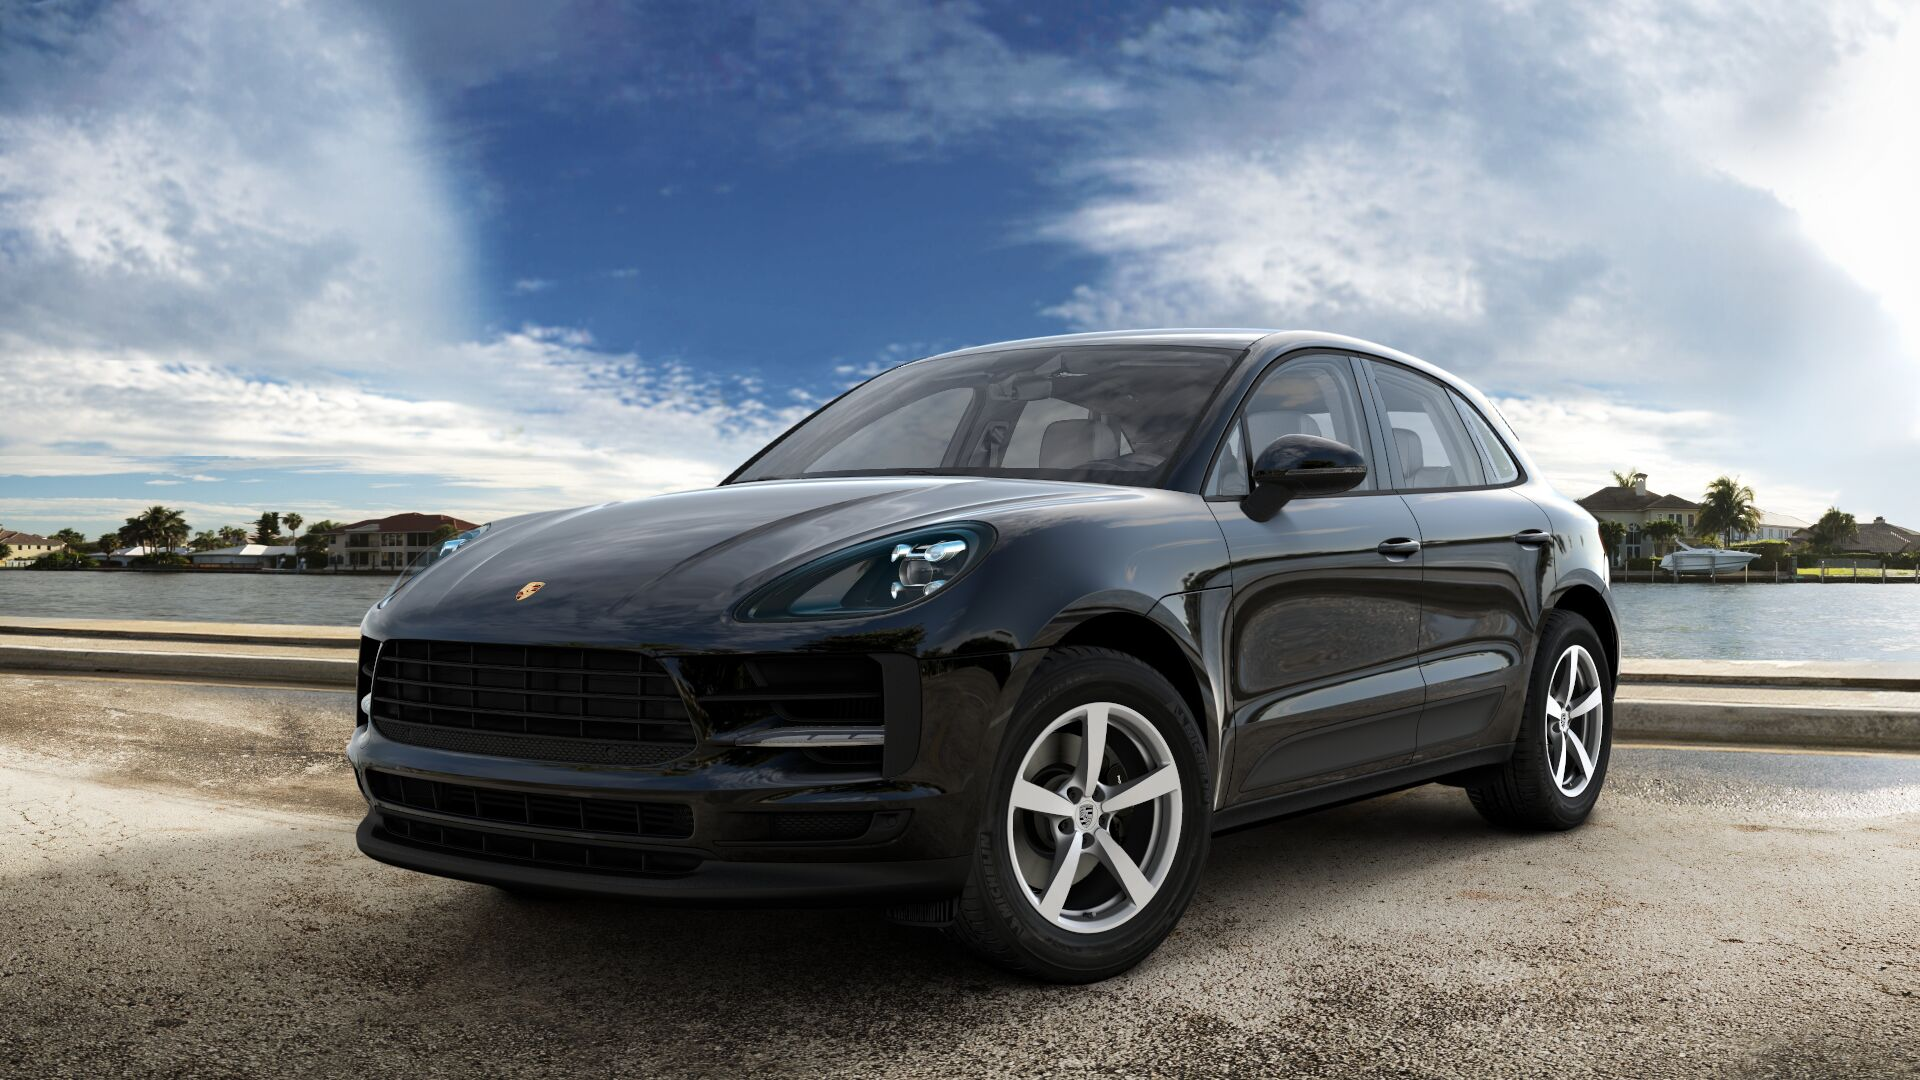 Porsche Macan Tiêu chuẩn SUV/Crossover 2019